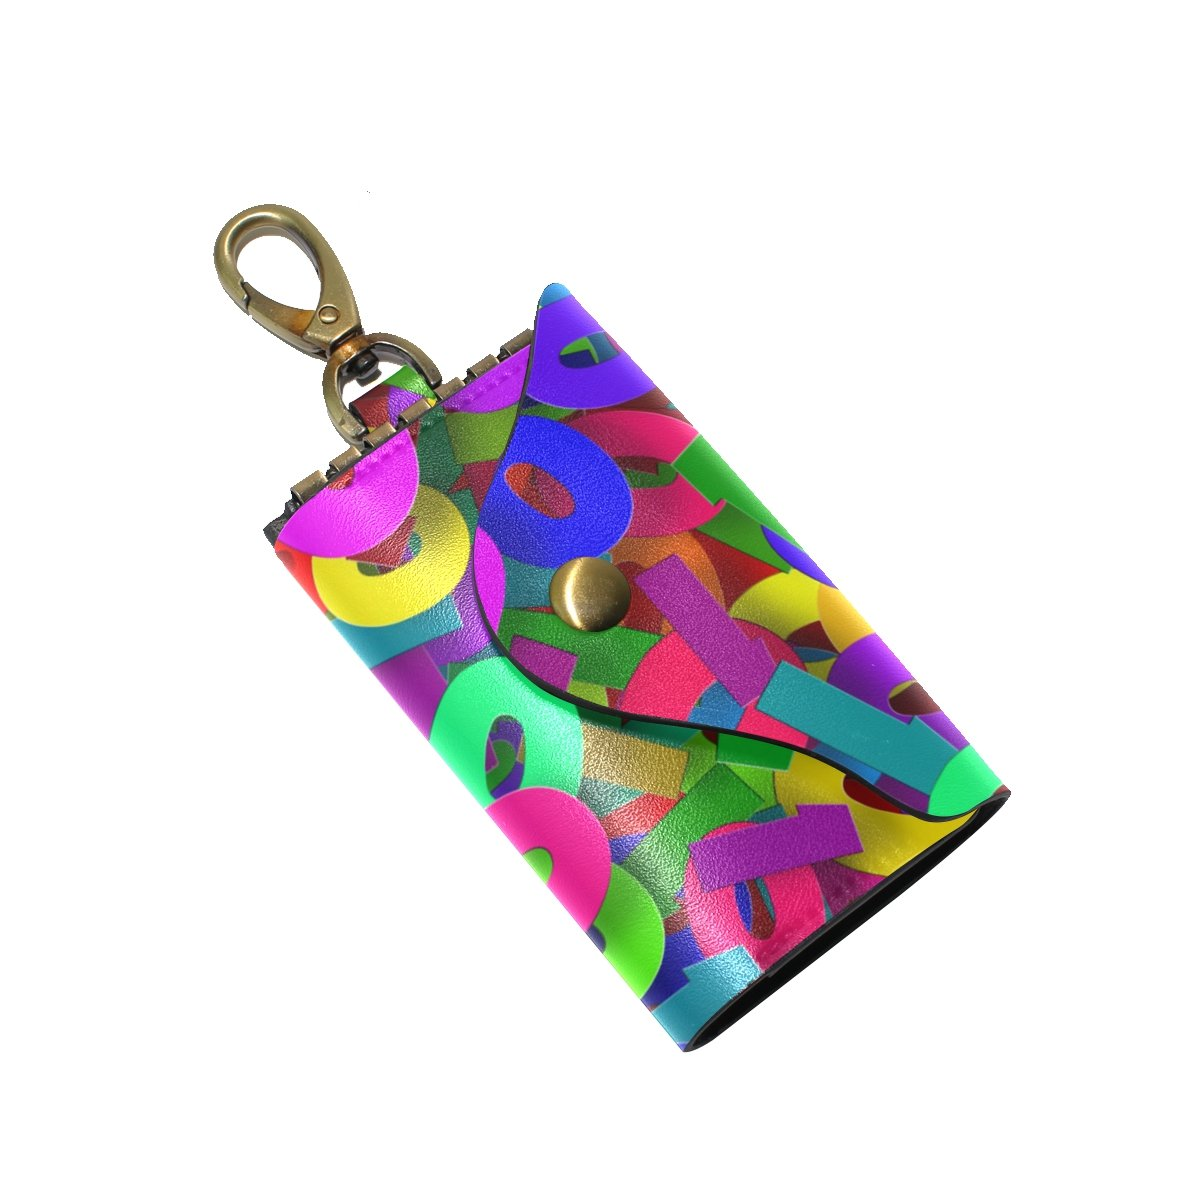 DEYYA Binary Digits Leather Key Case Wallets Unisex Keychain Key Holder with 6 Hooks Snap Closure